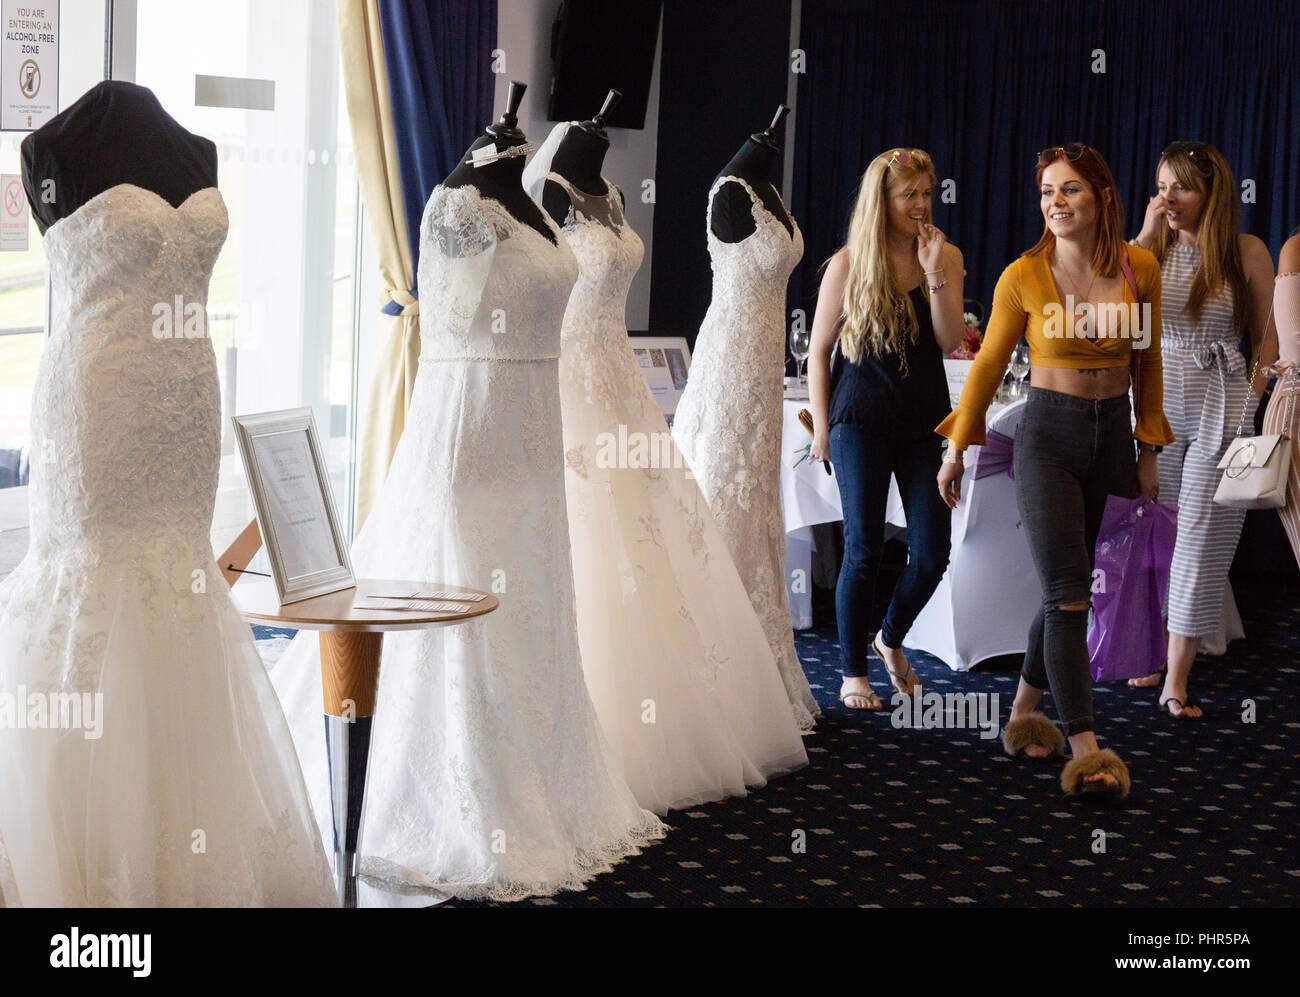 4bd178511ba Wedding Dresses Stock Photos   Wedding Dresses Stock Images - Alamy